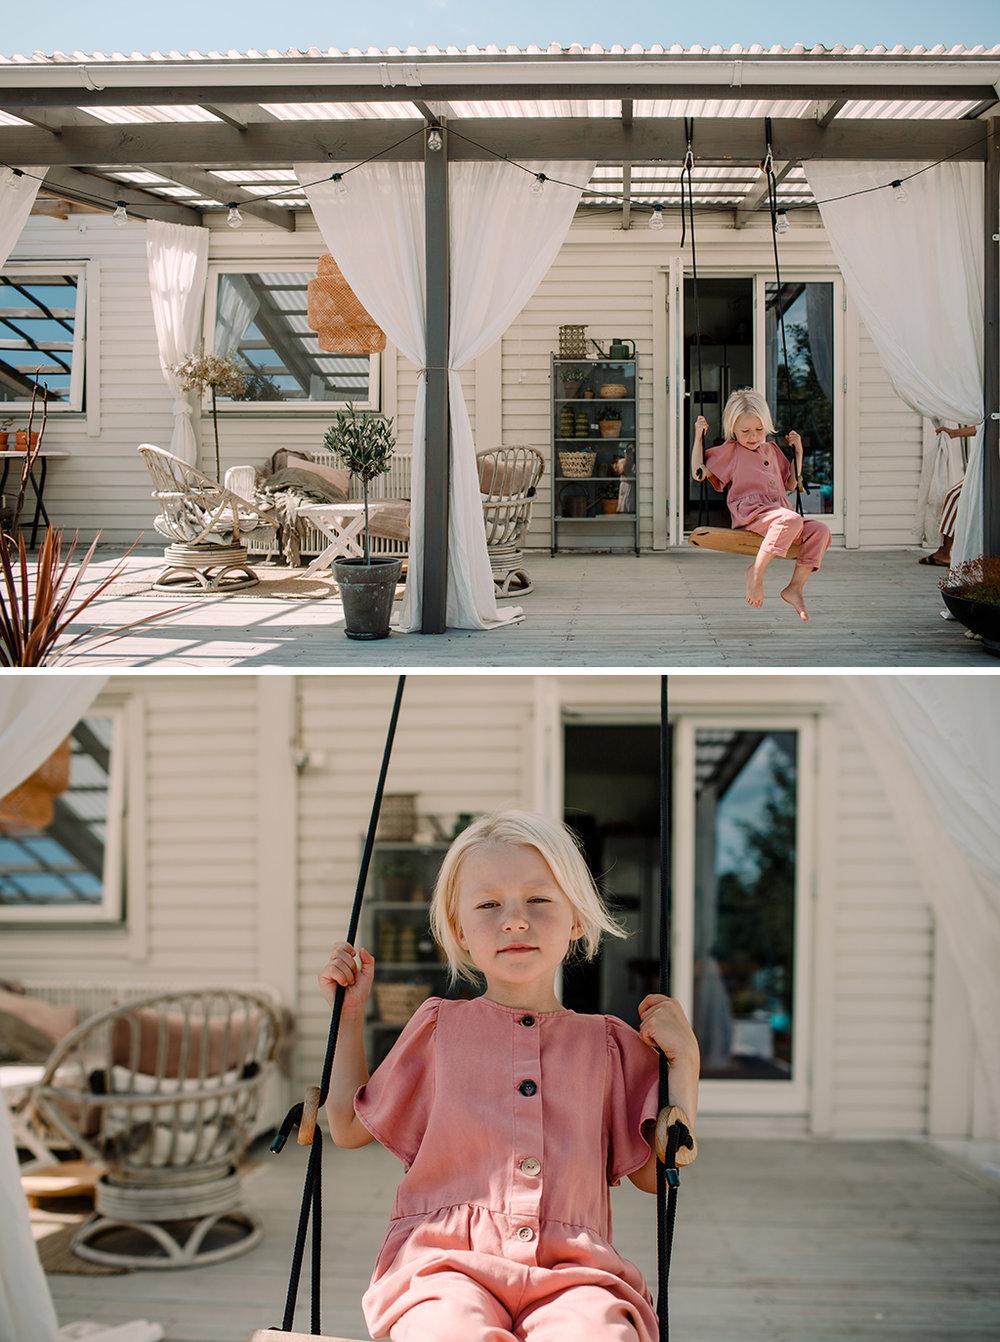 Lifestyle_familjefotografering_Stockholm_hemma-hos-fotografering_lifestyle-inhome-session_11.jpg